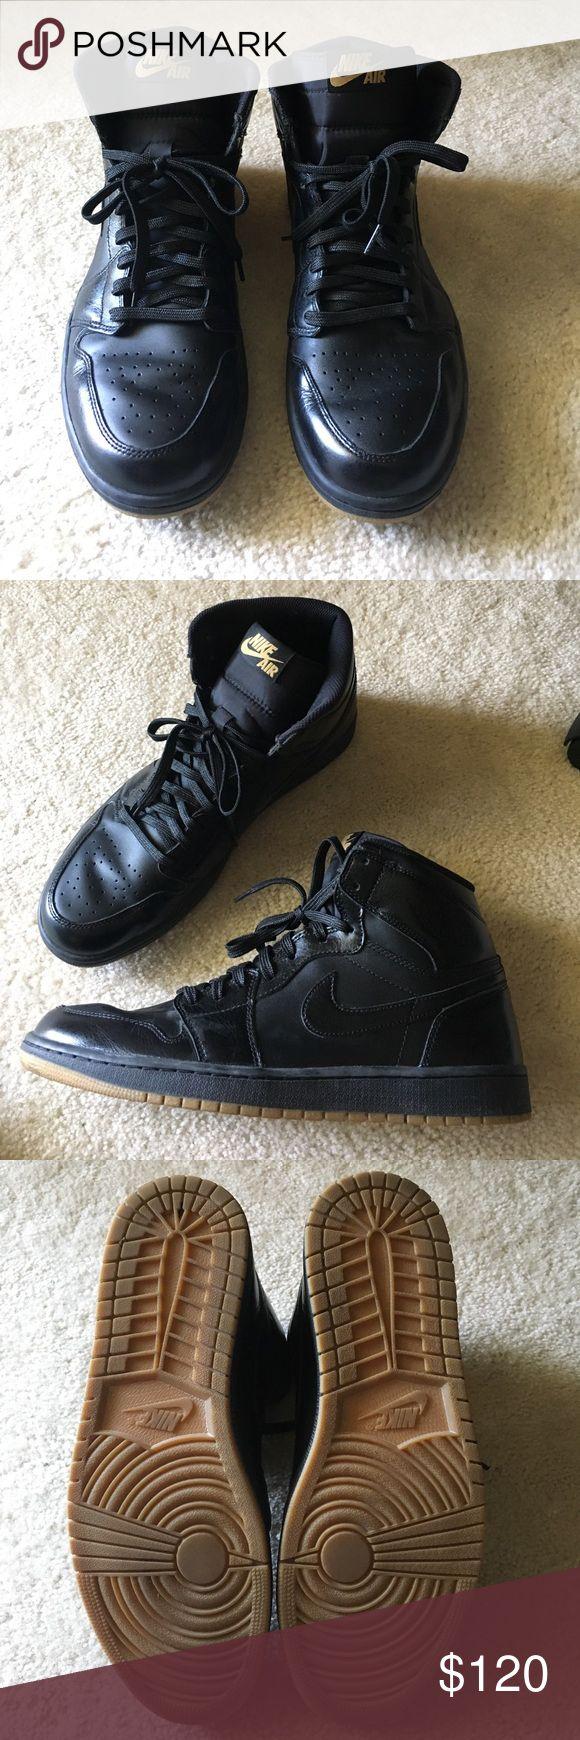 Air Jordan 1 retro high OG black/gum Like new- only worn a few times Air Jordan Shoes Sneakers